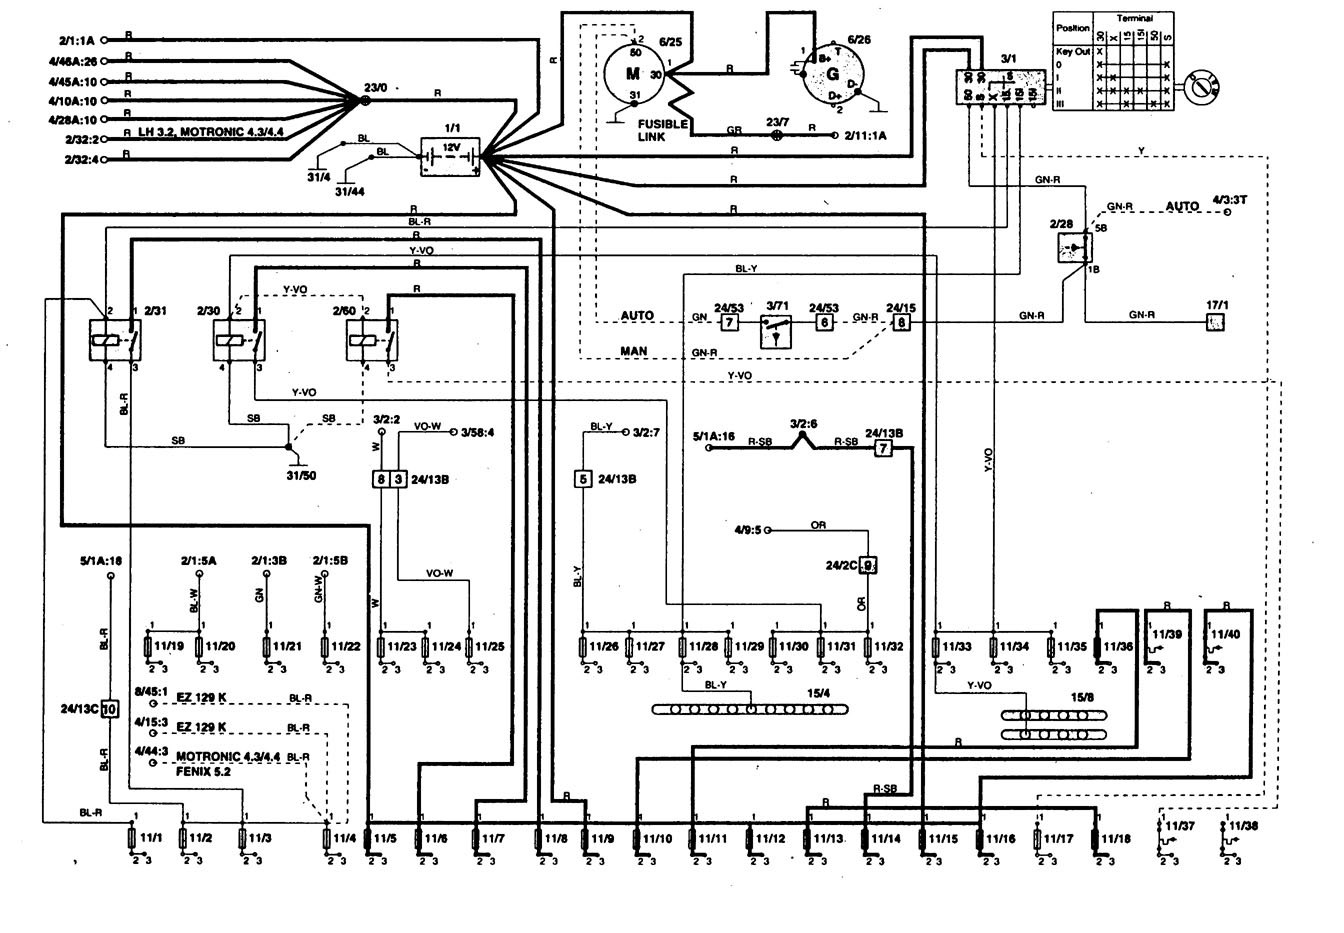 volvo wiring diagrams 850 2003 gmc yukon stereo diagram 1997 power distribution